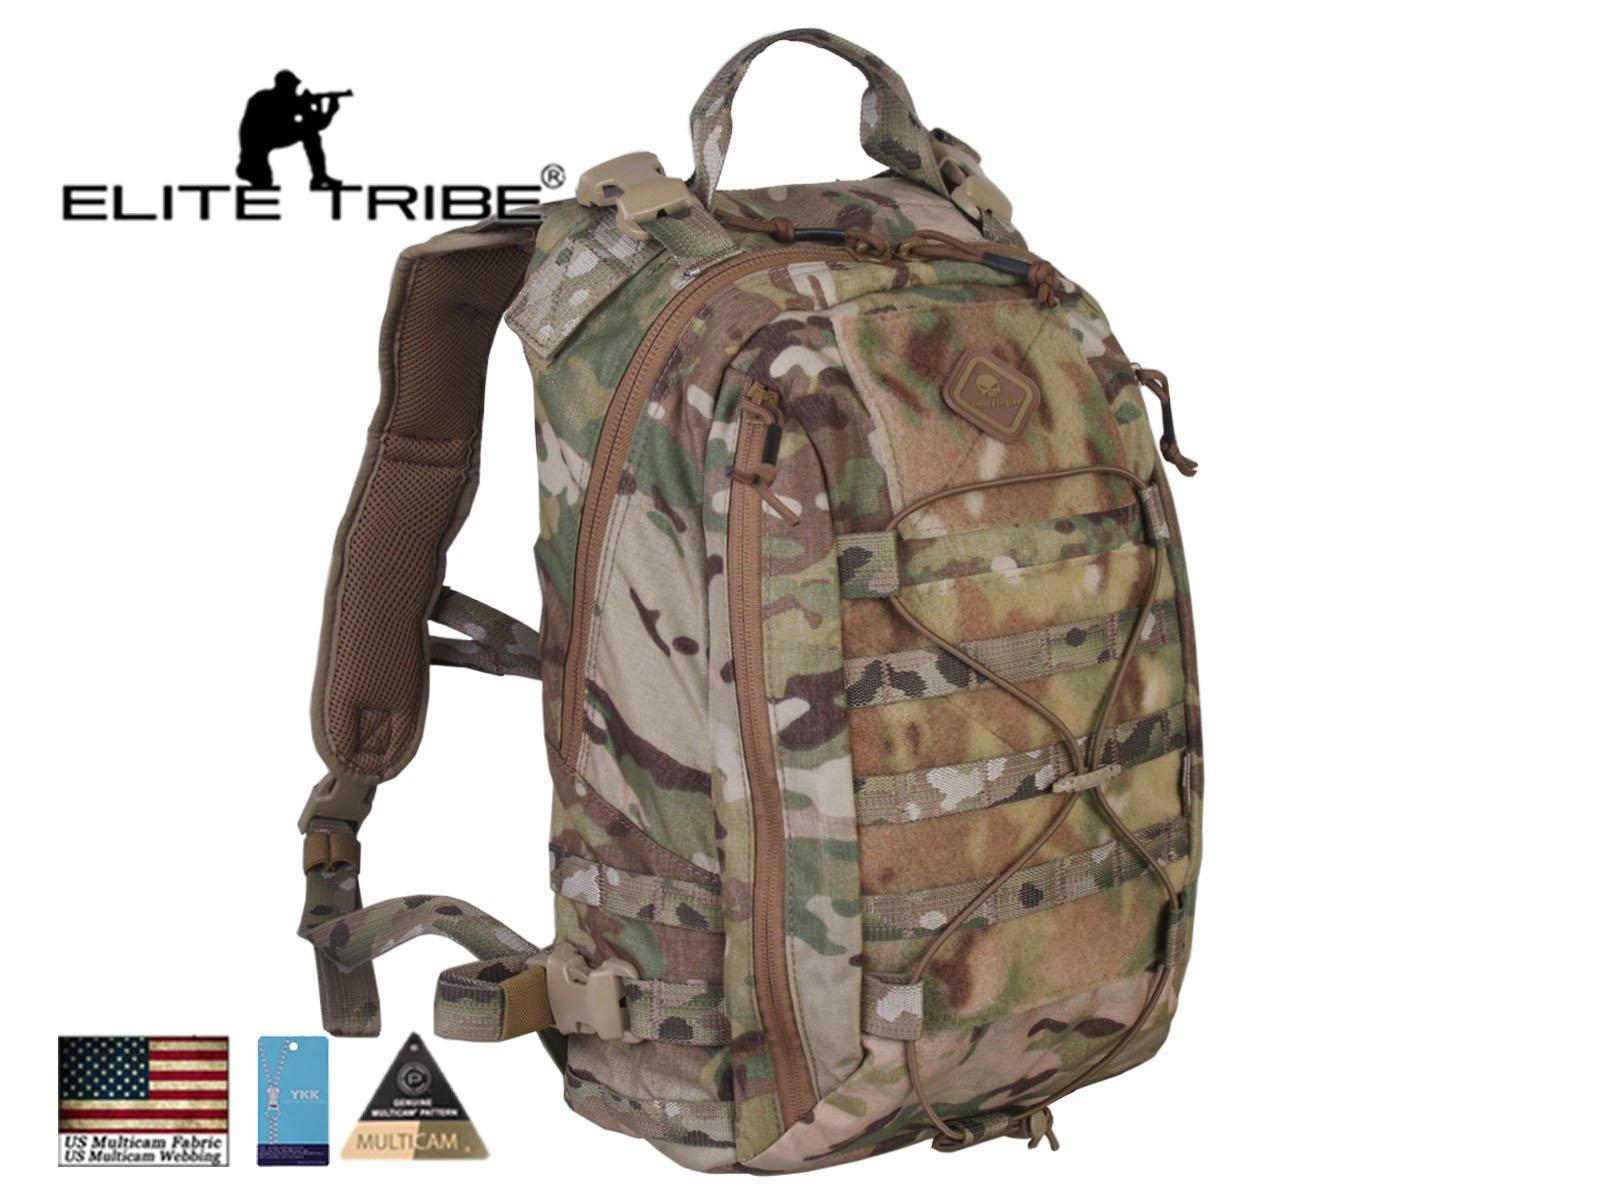 Elite Tribe Military Hunting Bag Tactical Assault Backpack Removable Operator Pack Multicam